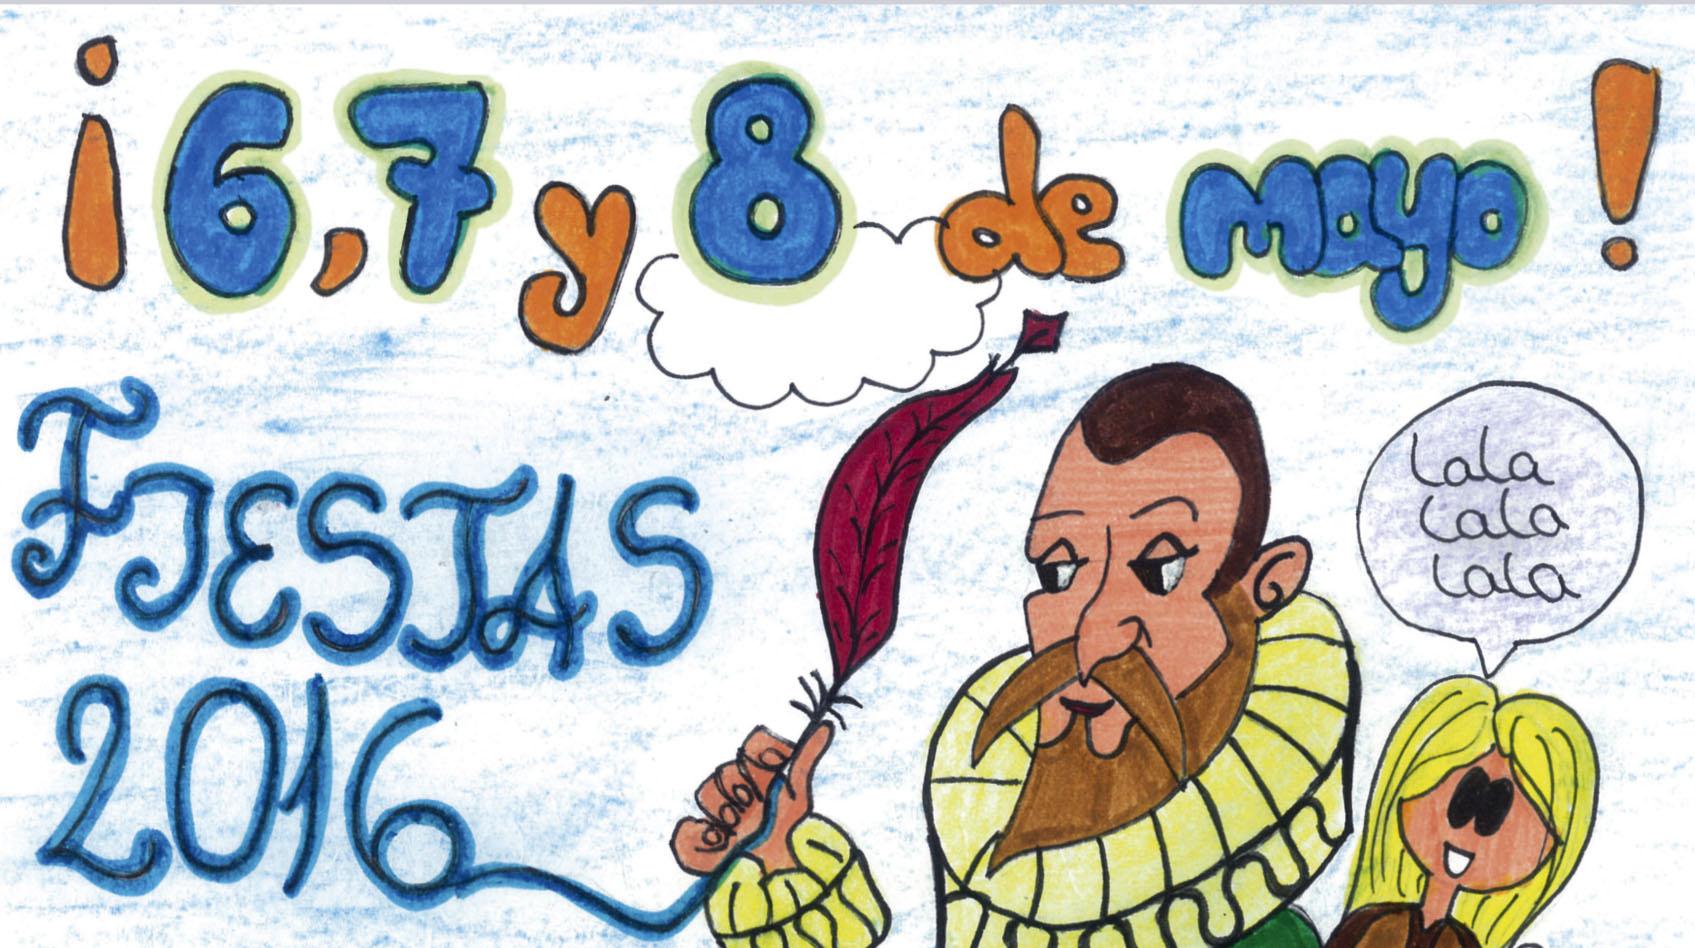 Concurso de carteles de fiestas news jesuitas for Concurso para profesores 2016